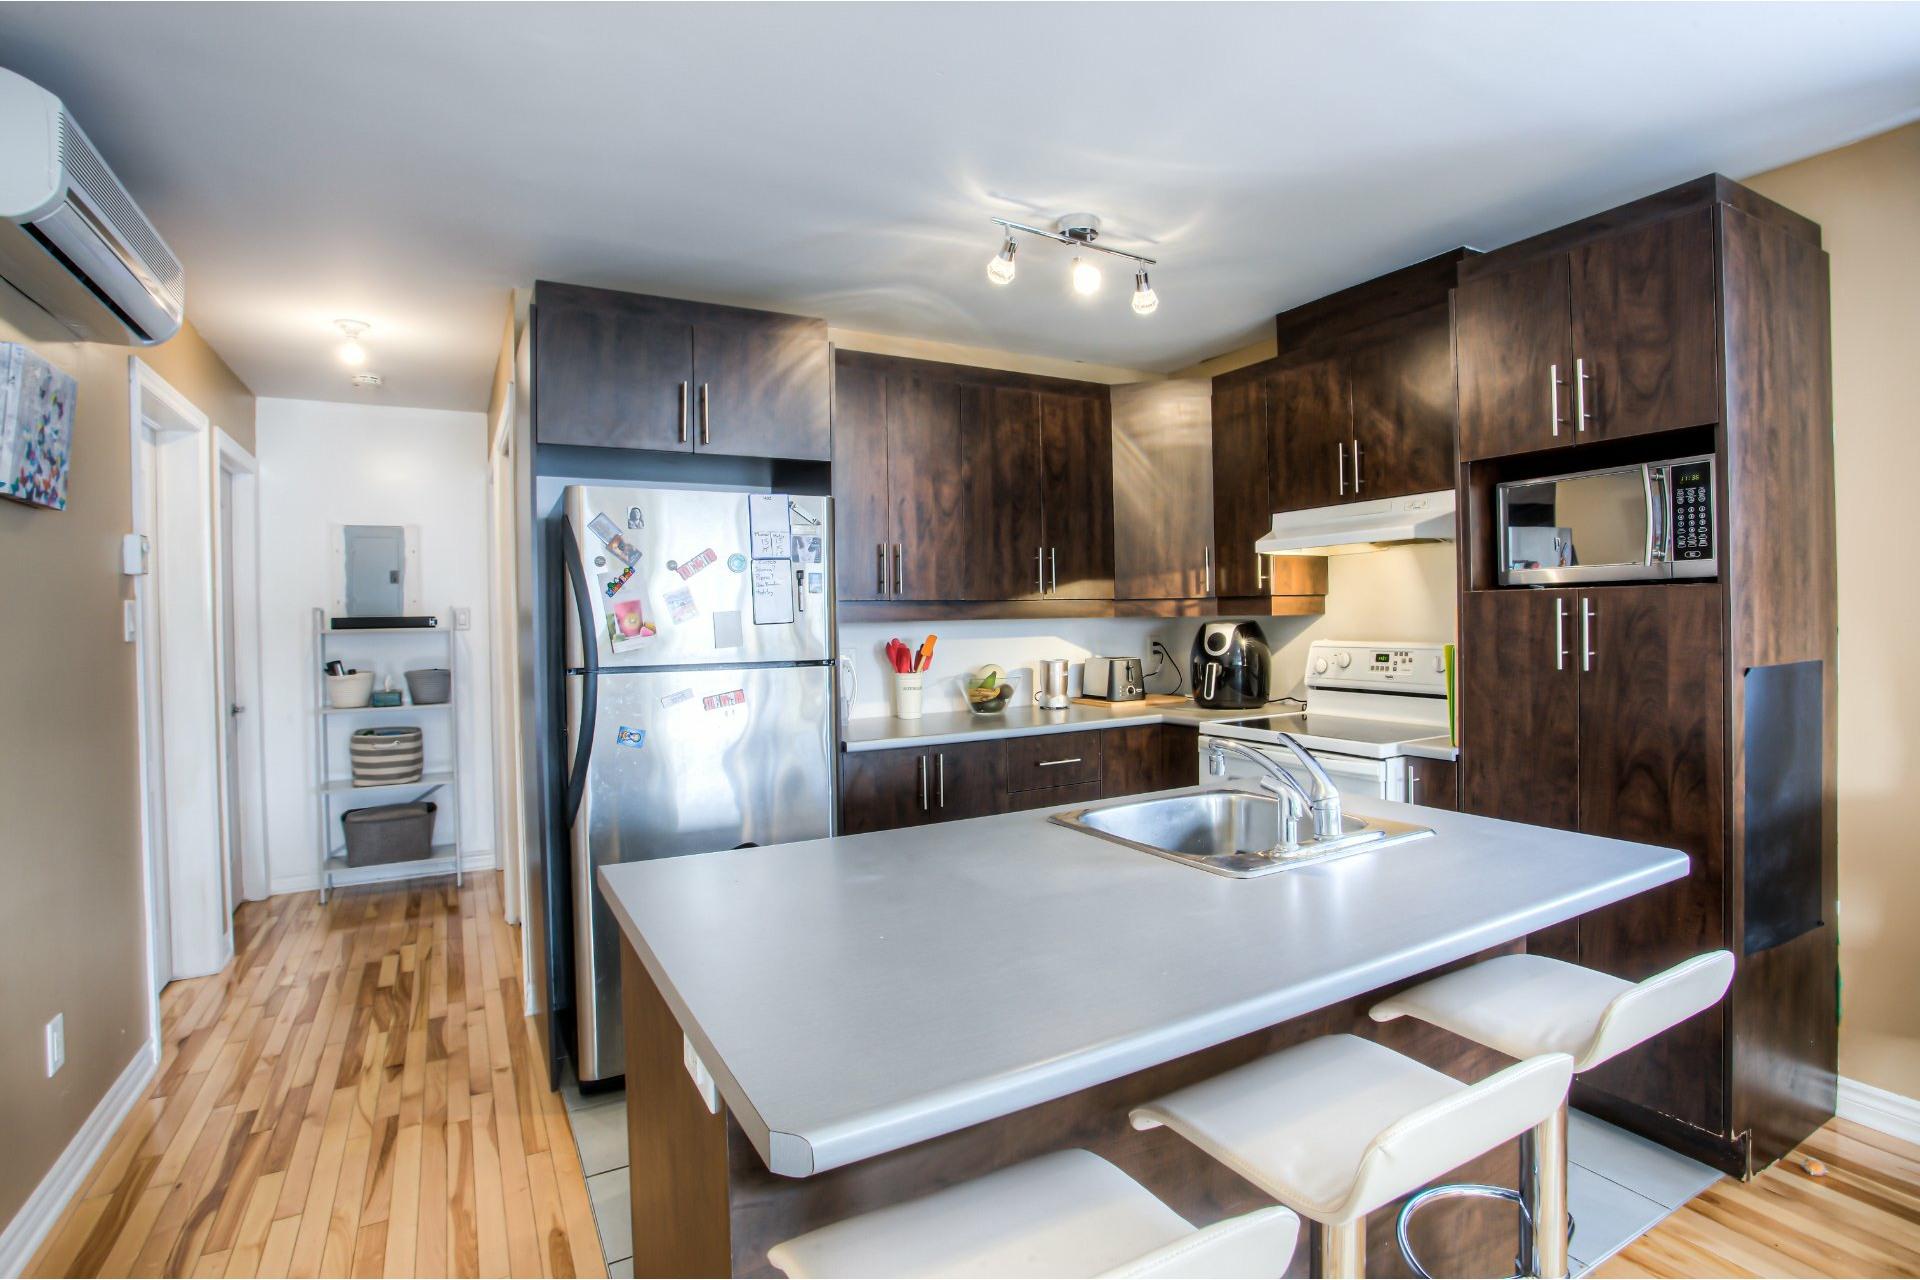 image 13 - Departamento Para alquiler Villeray/Saint-Michel/Parc-Extension Montréal  - 5 habitaciones